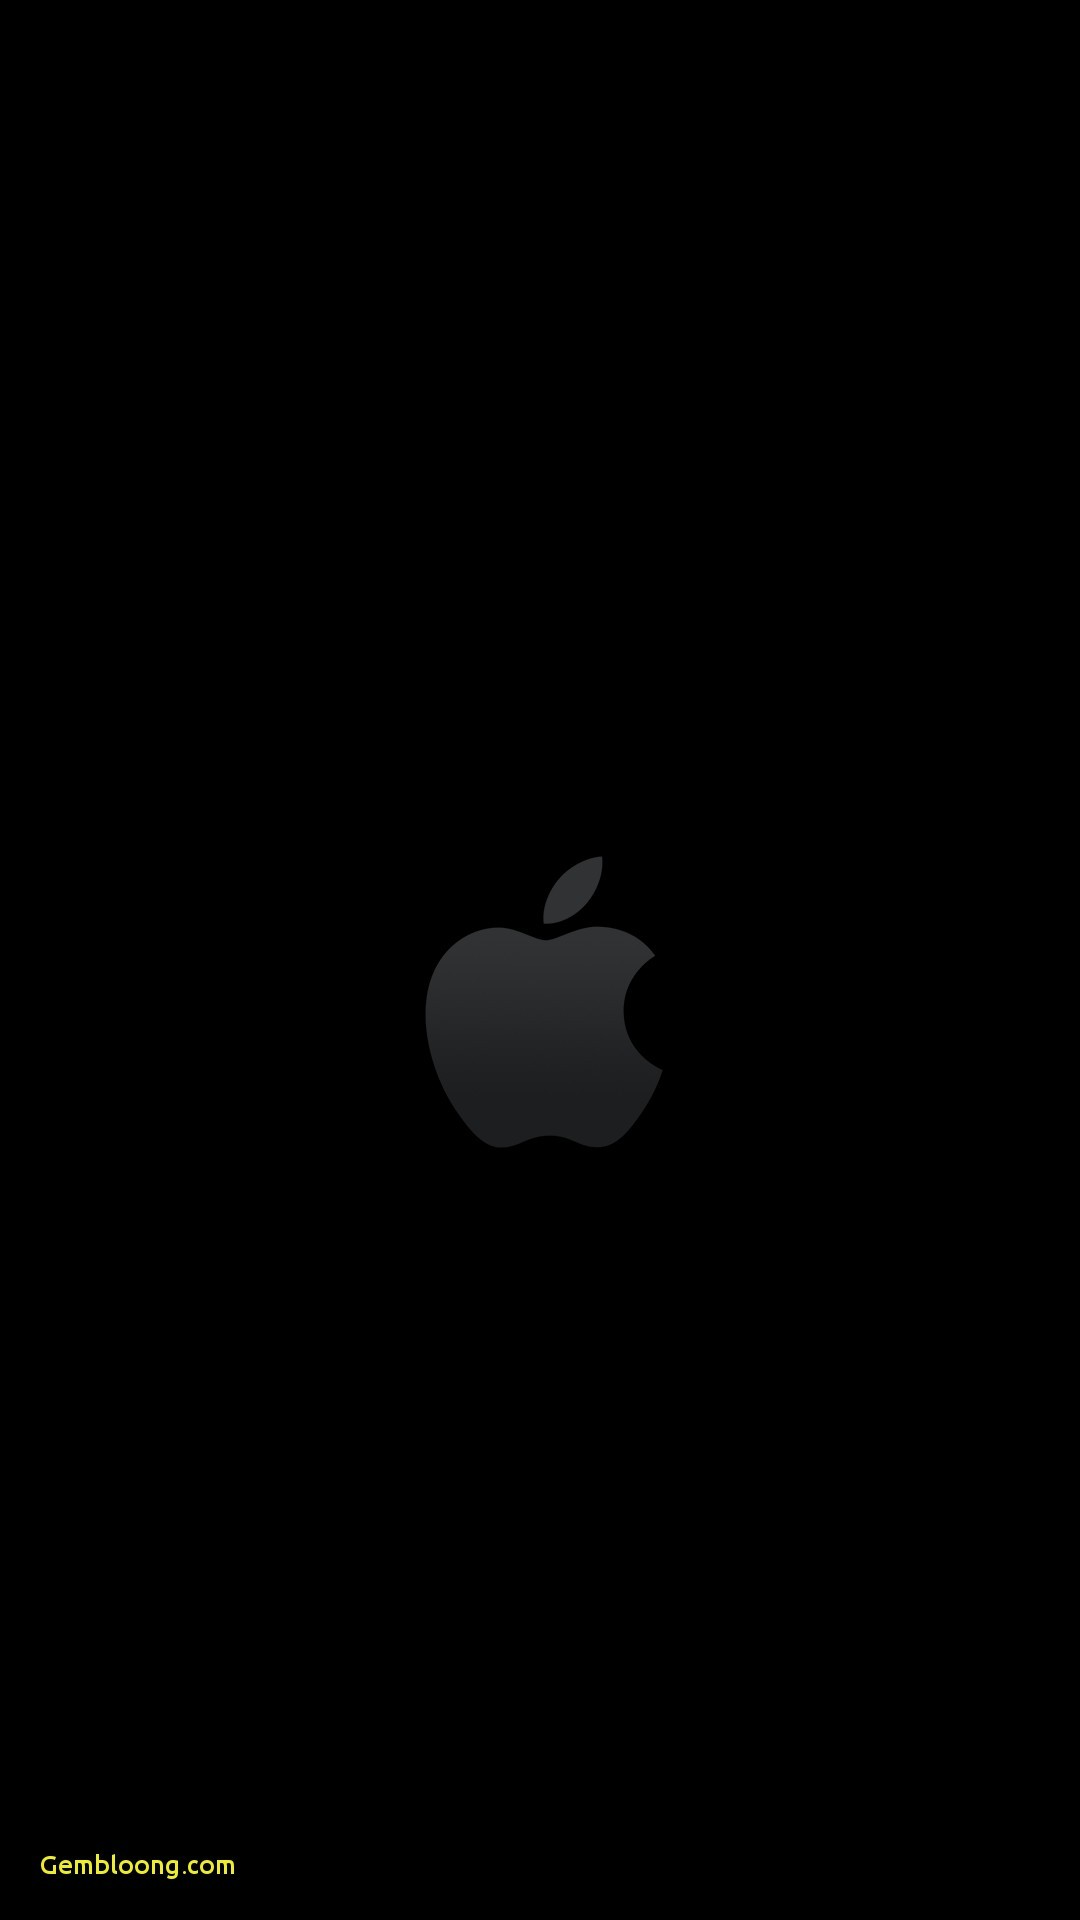 Wallpaper Android Vs Apple Hd Fresh Best Black Screen